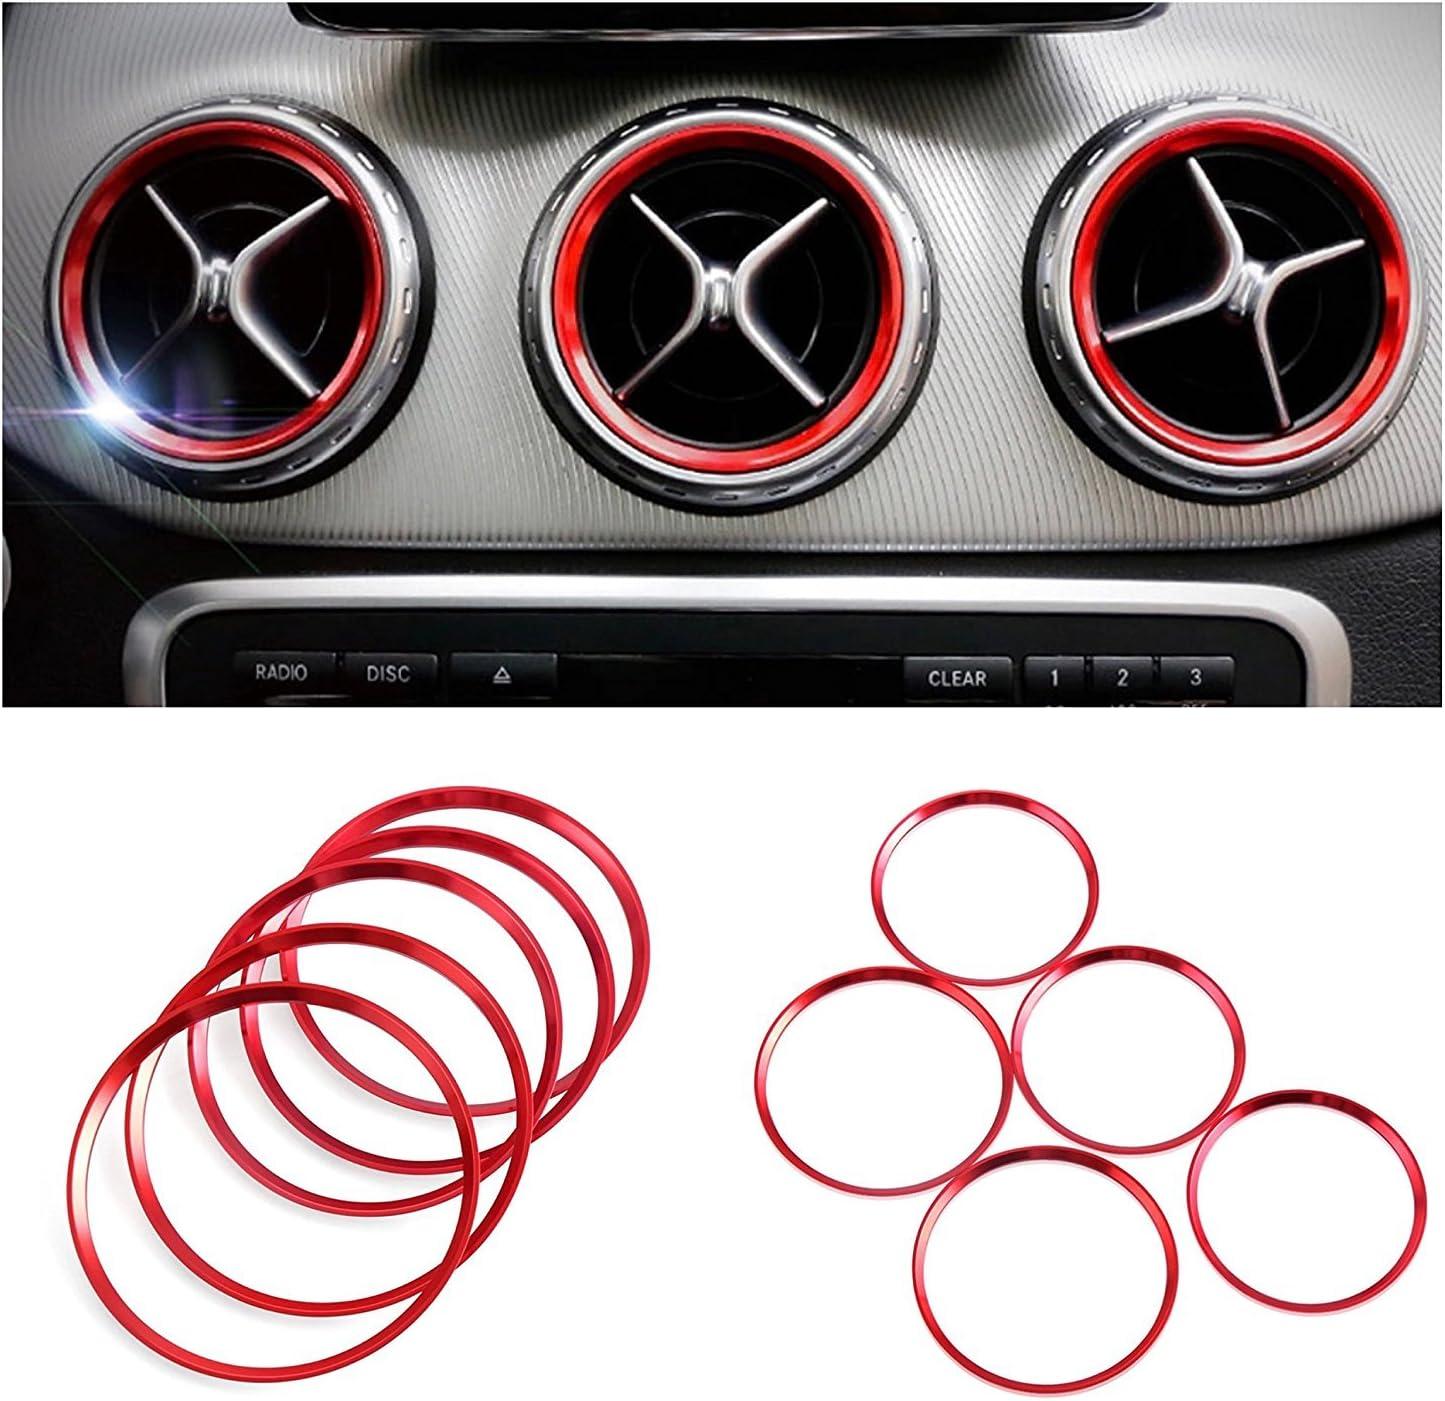 Emblem Trading Emblem Innenraum Set Lüftungs Ringe Rahmen Zierring Für A B Gla Cla W176 W246 X157 C117 Auto